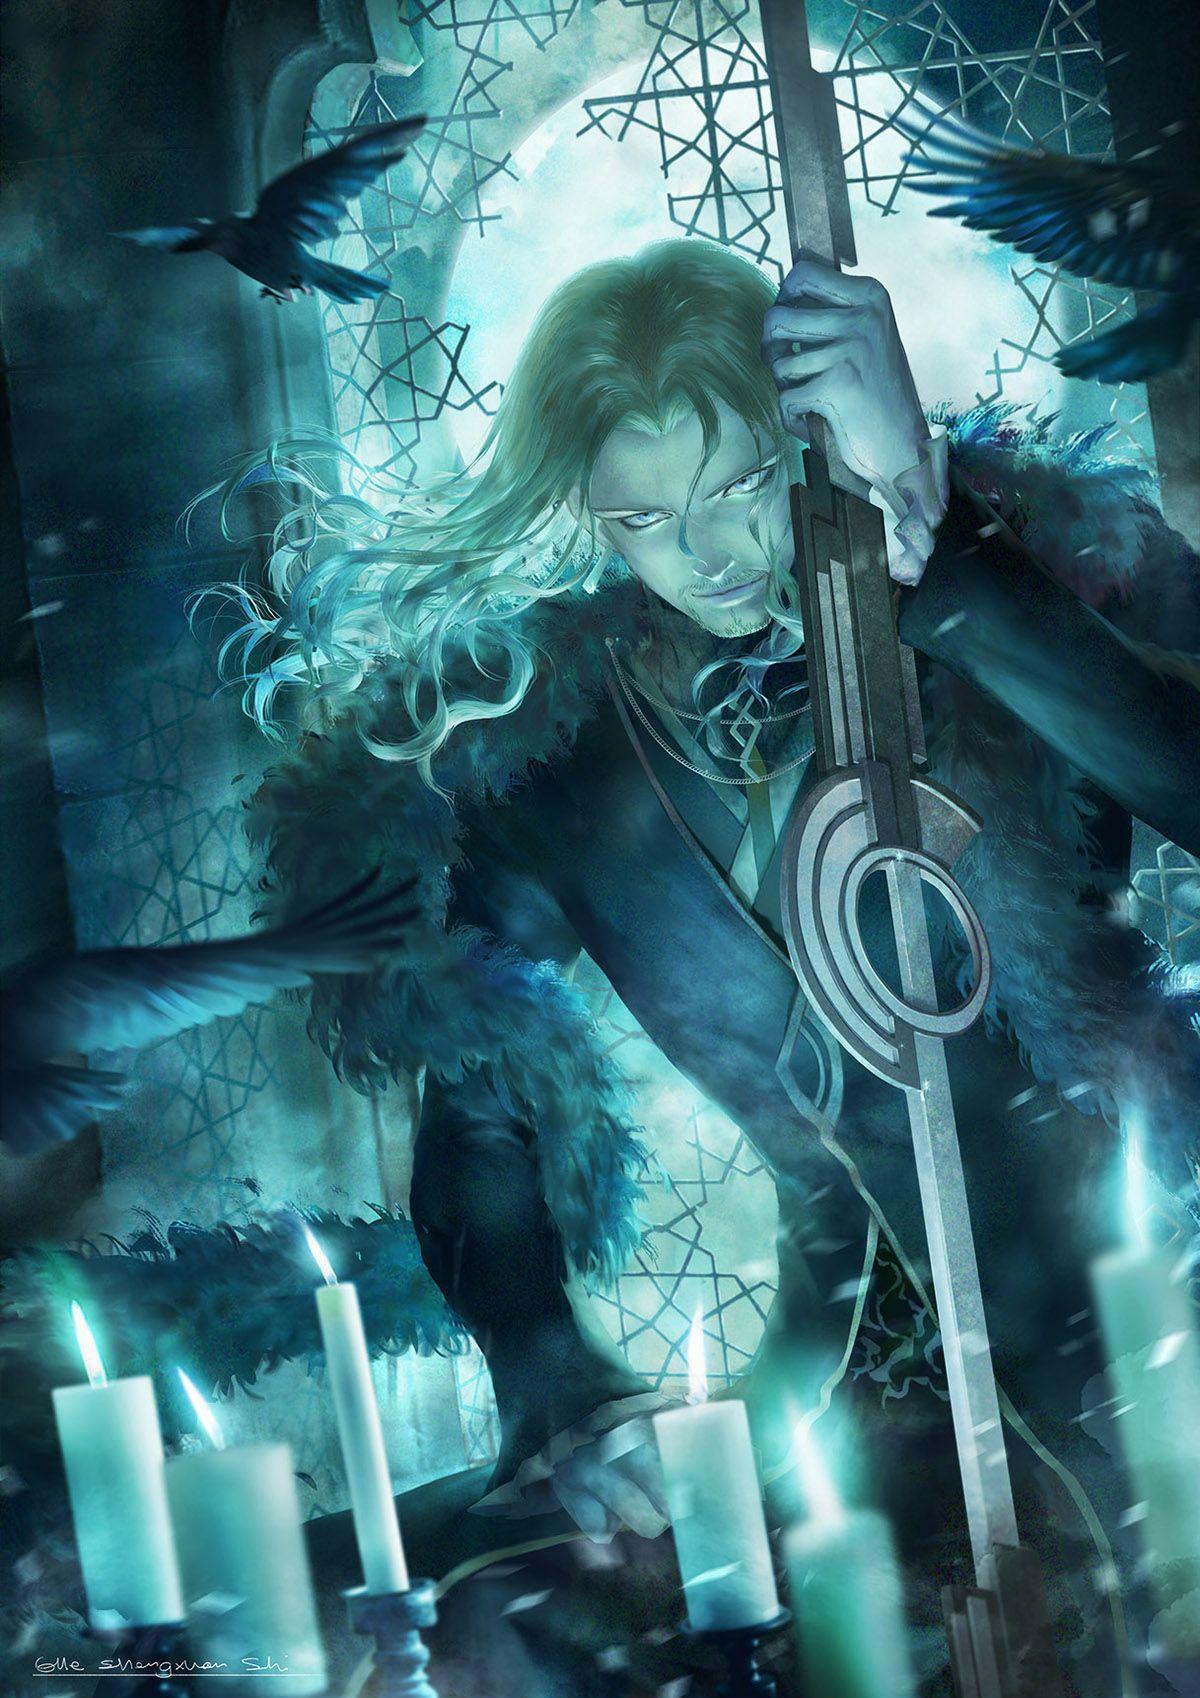 Vlad Iii Fate Apocrypha Personagens De Anime Anime Personagens